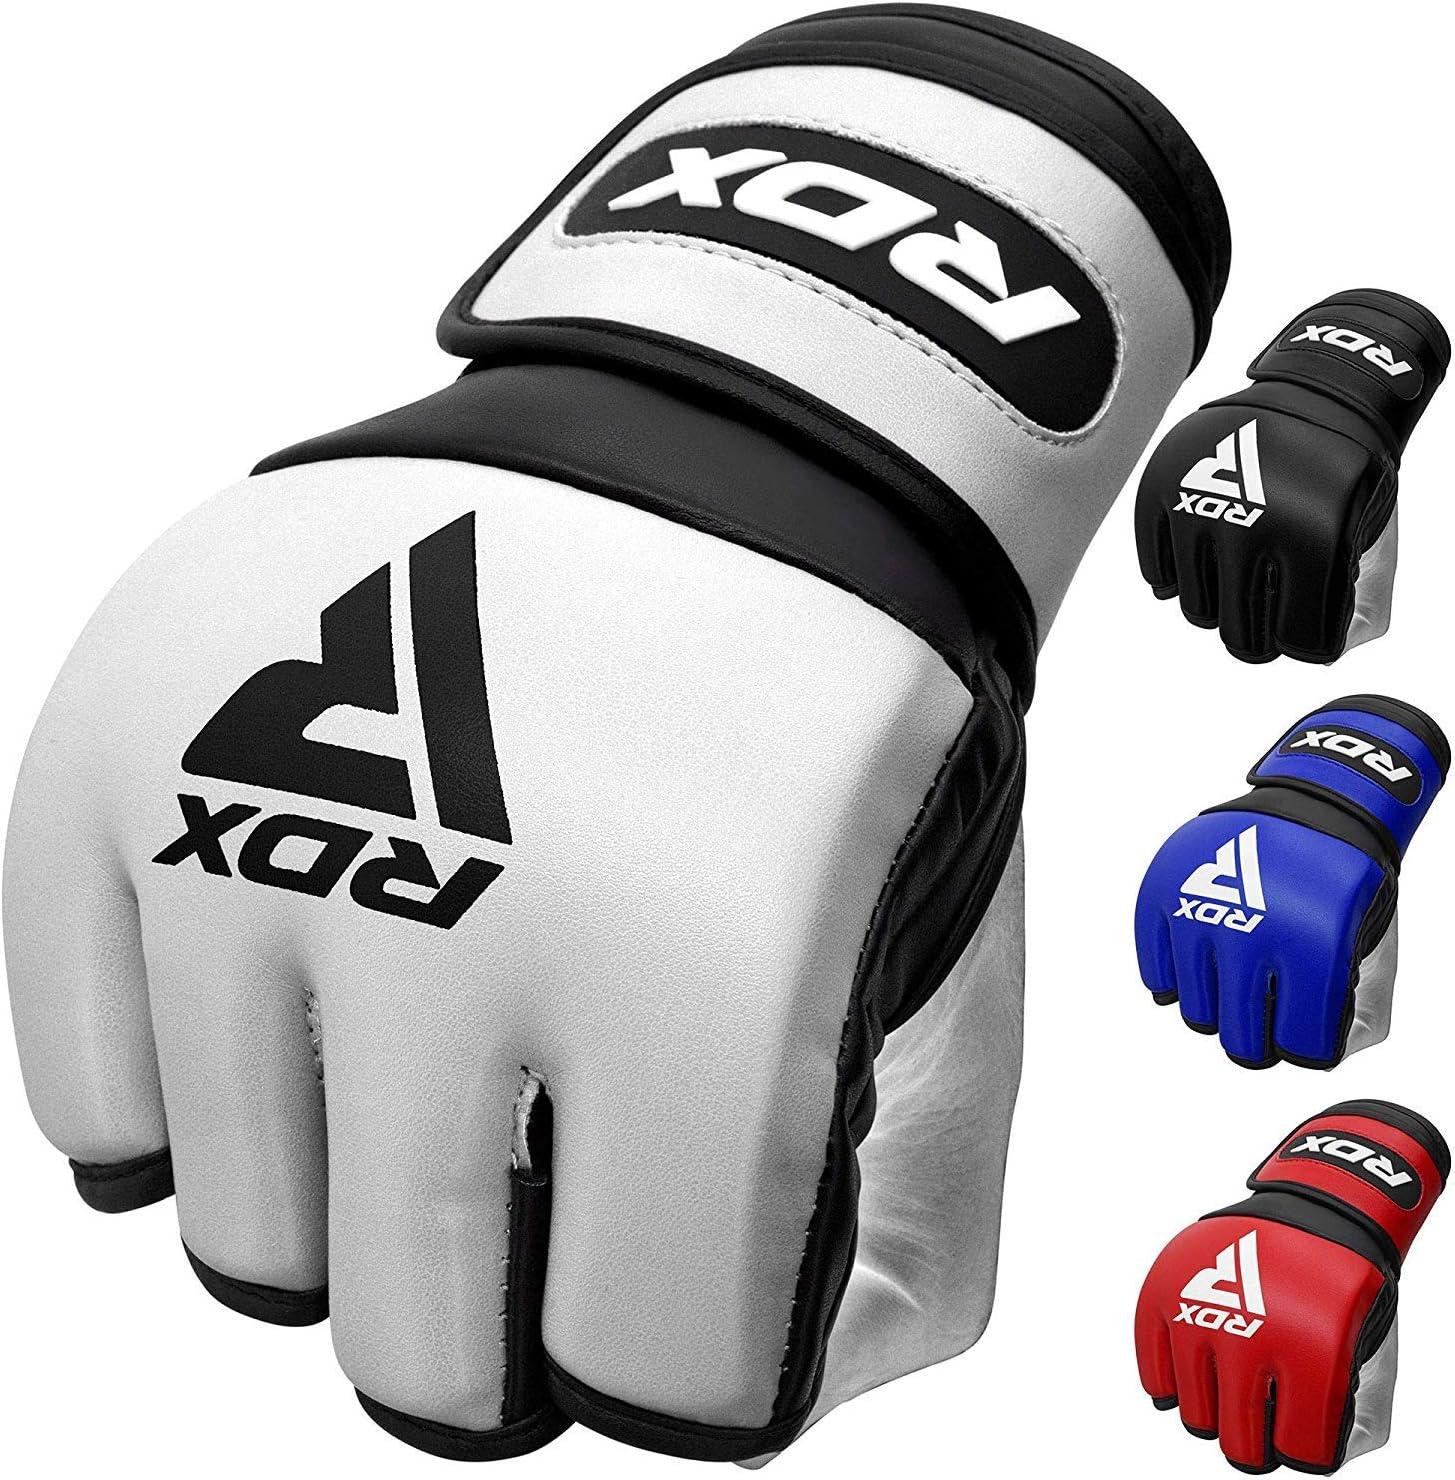 RDX MMA Gloves for Philadelphia Mall Martial Arts Training D. Cut Grappling Open Oklahoma City Mall